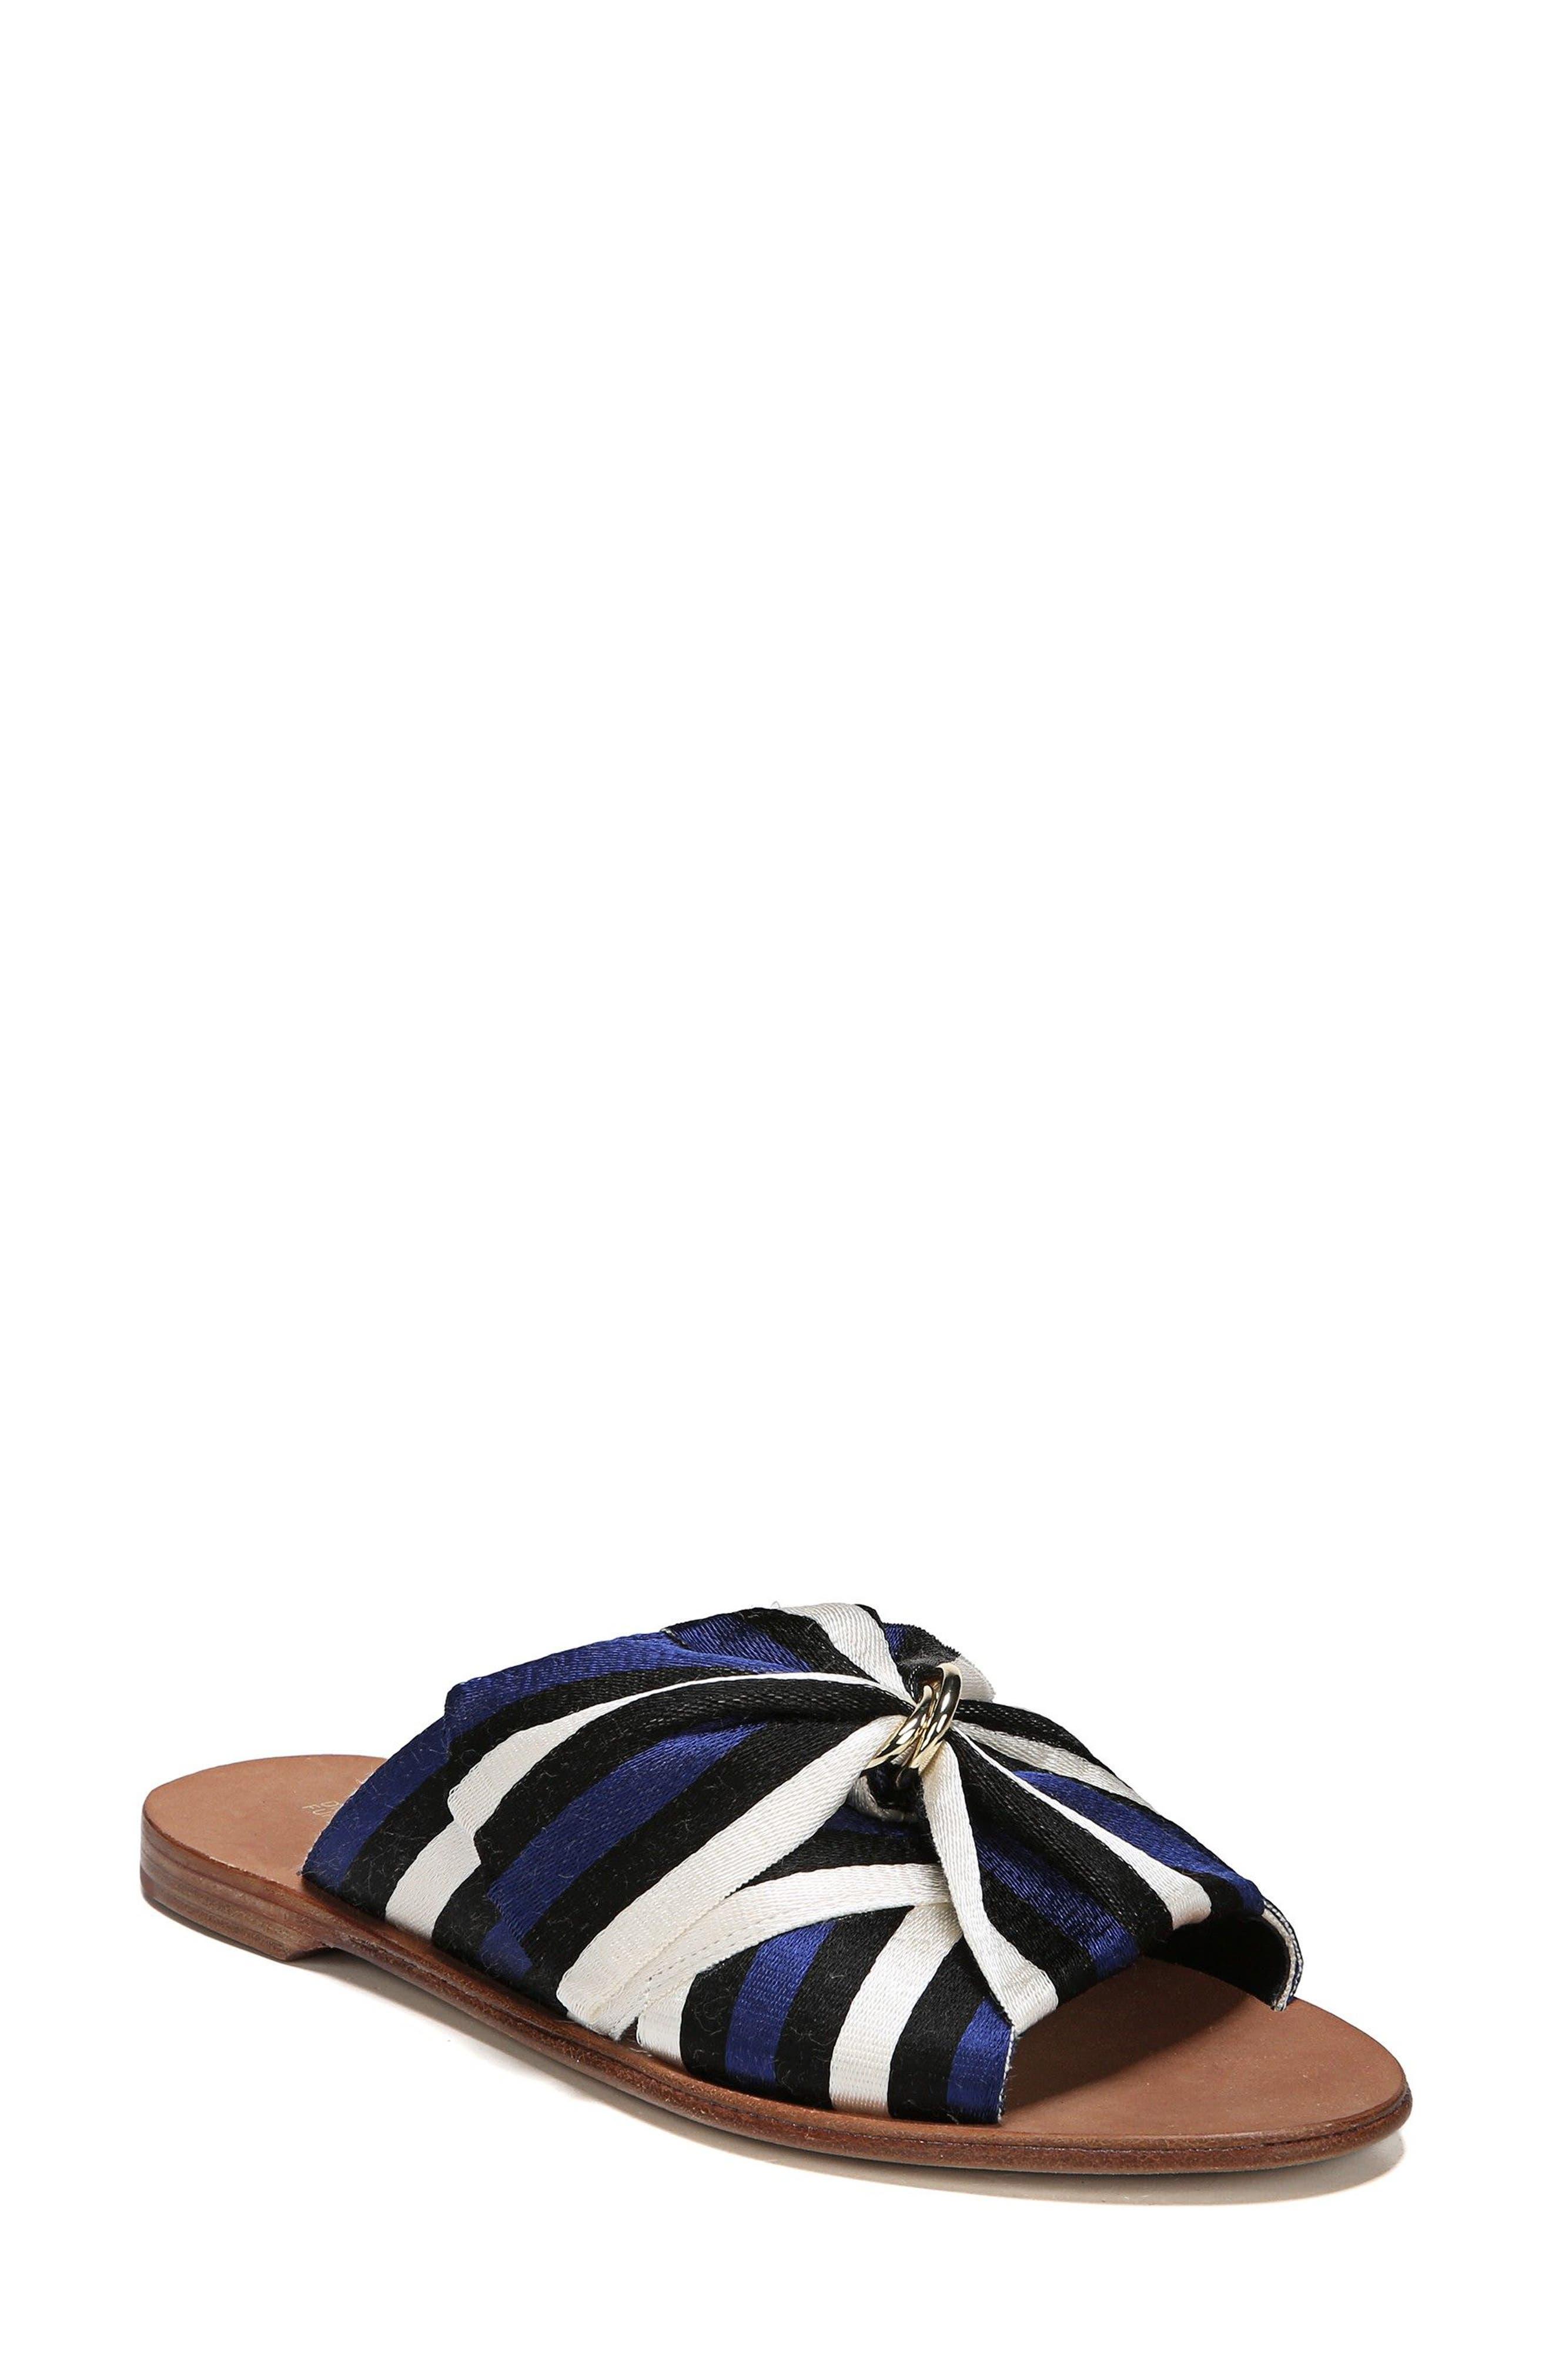 Bella Asymmetrical Slide Sandal,                             Main thumbnail 1, color,                             400